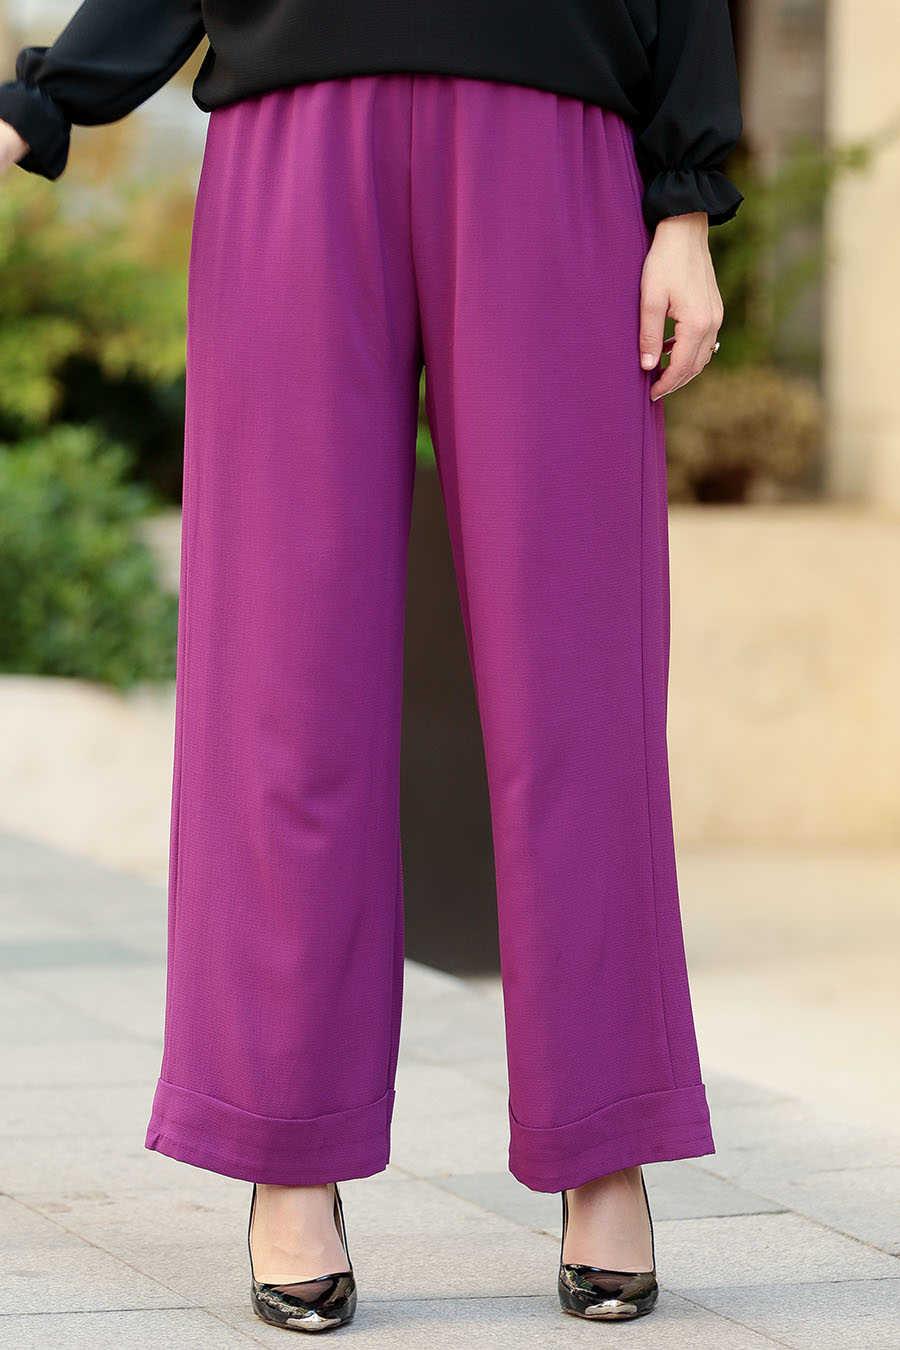 Neva Style - Plum Hijab Daily Dress 8122MU